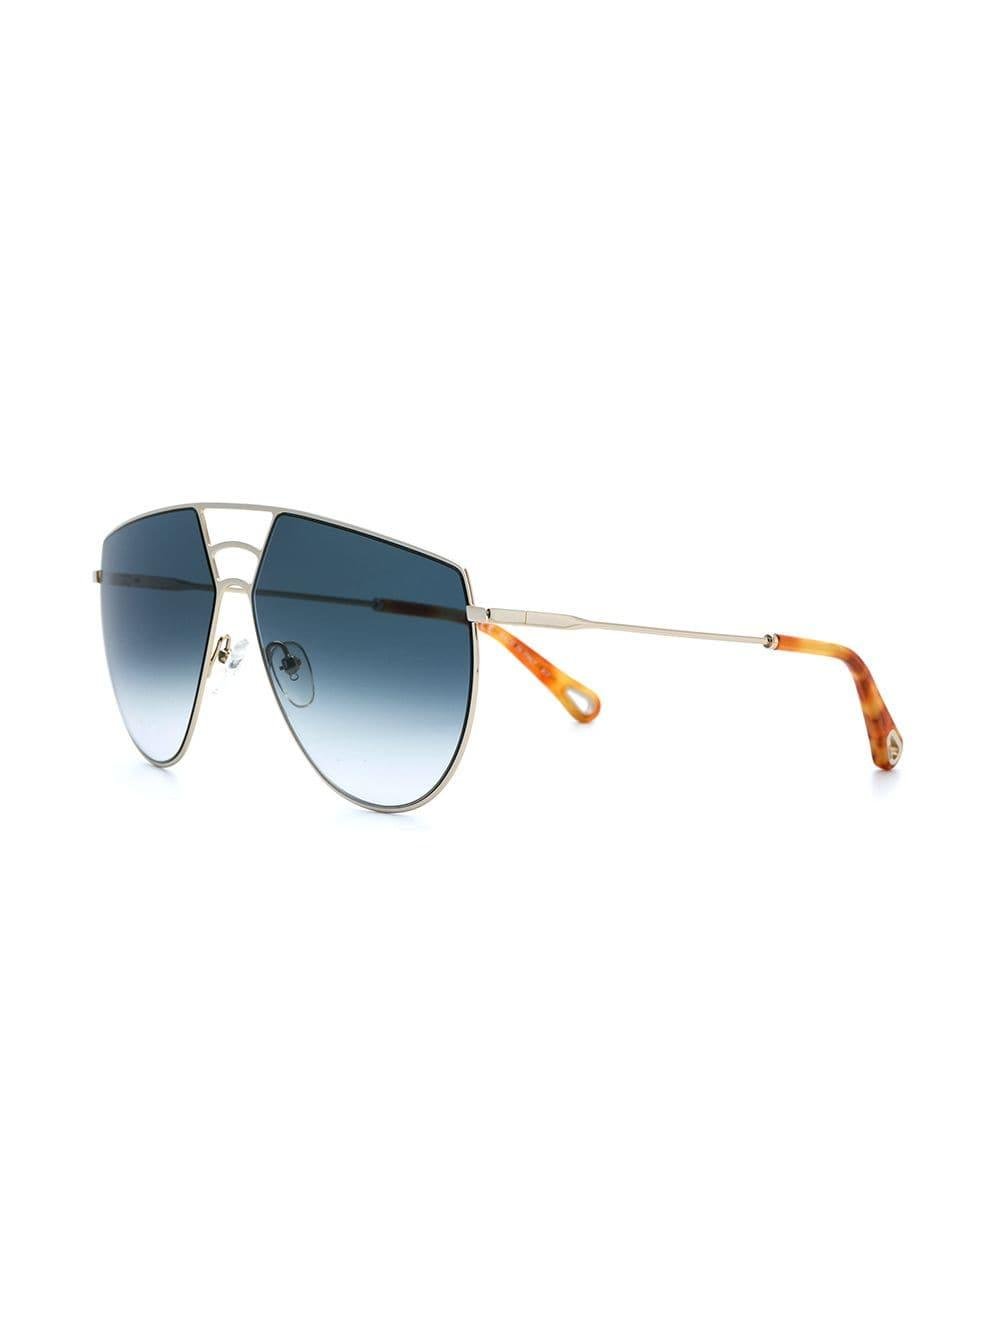 Chloé Ricky Sunglasses in Metallic